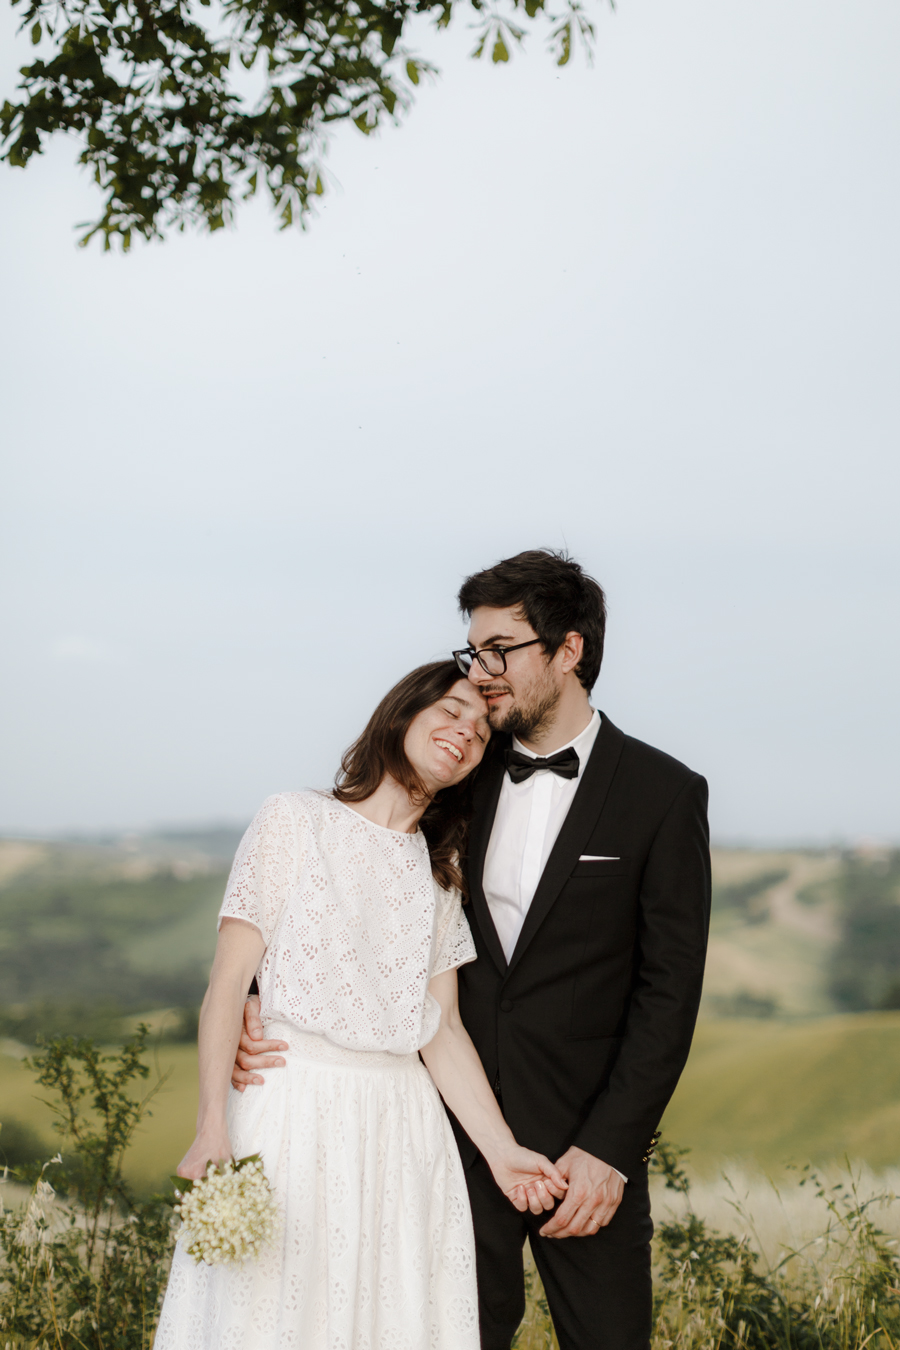 J+N_wedding_91.jpg